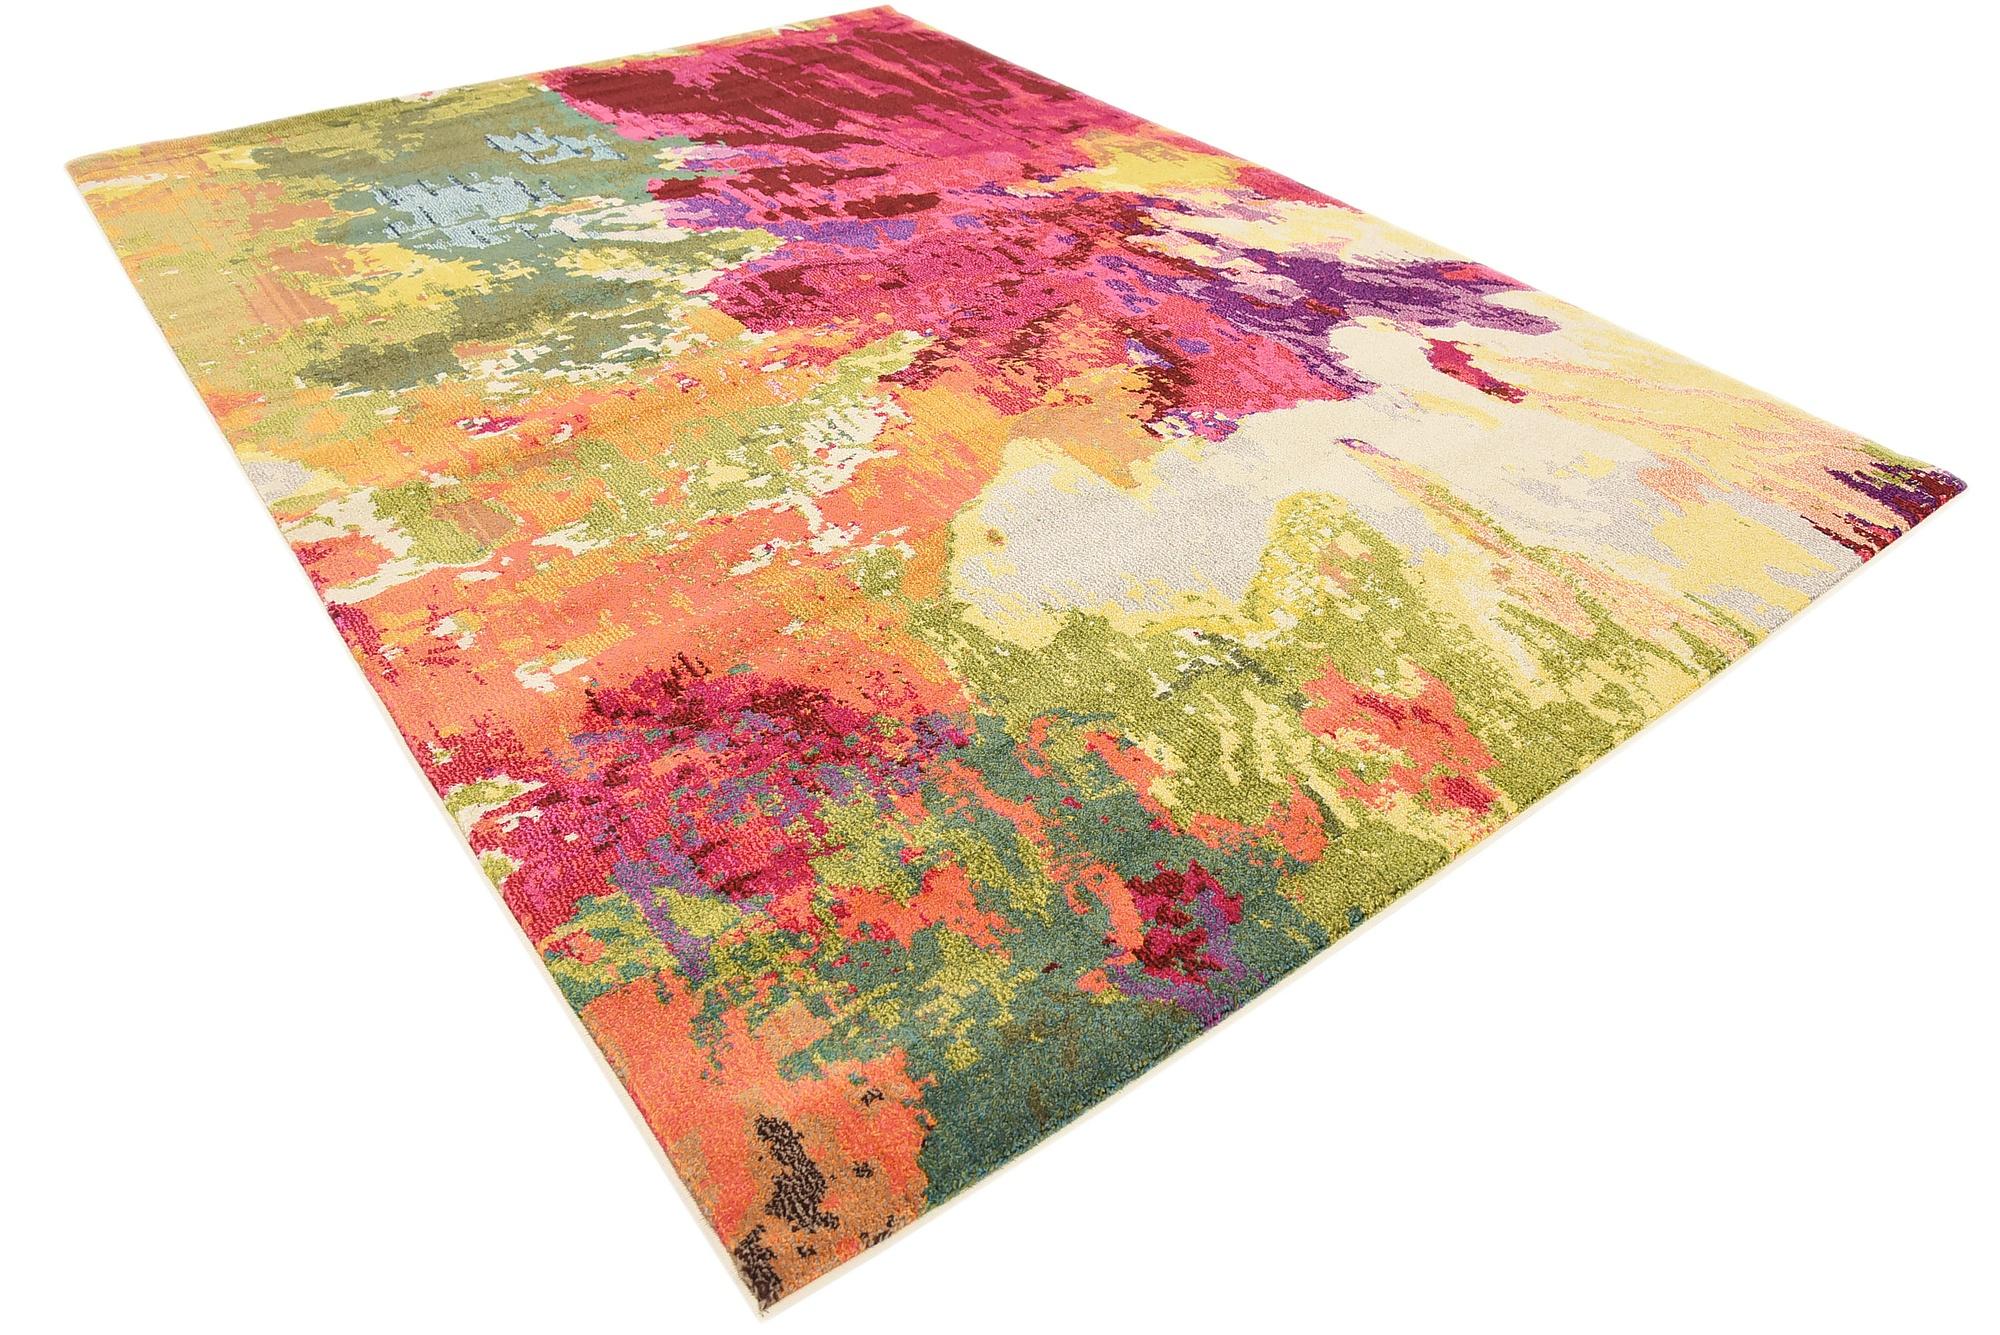 Floor carpet home decor rug floral area rugs modern over for Home decorators jules rug